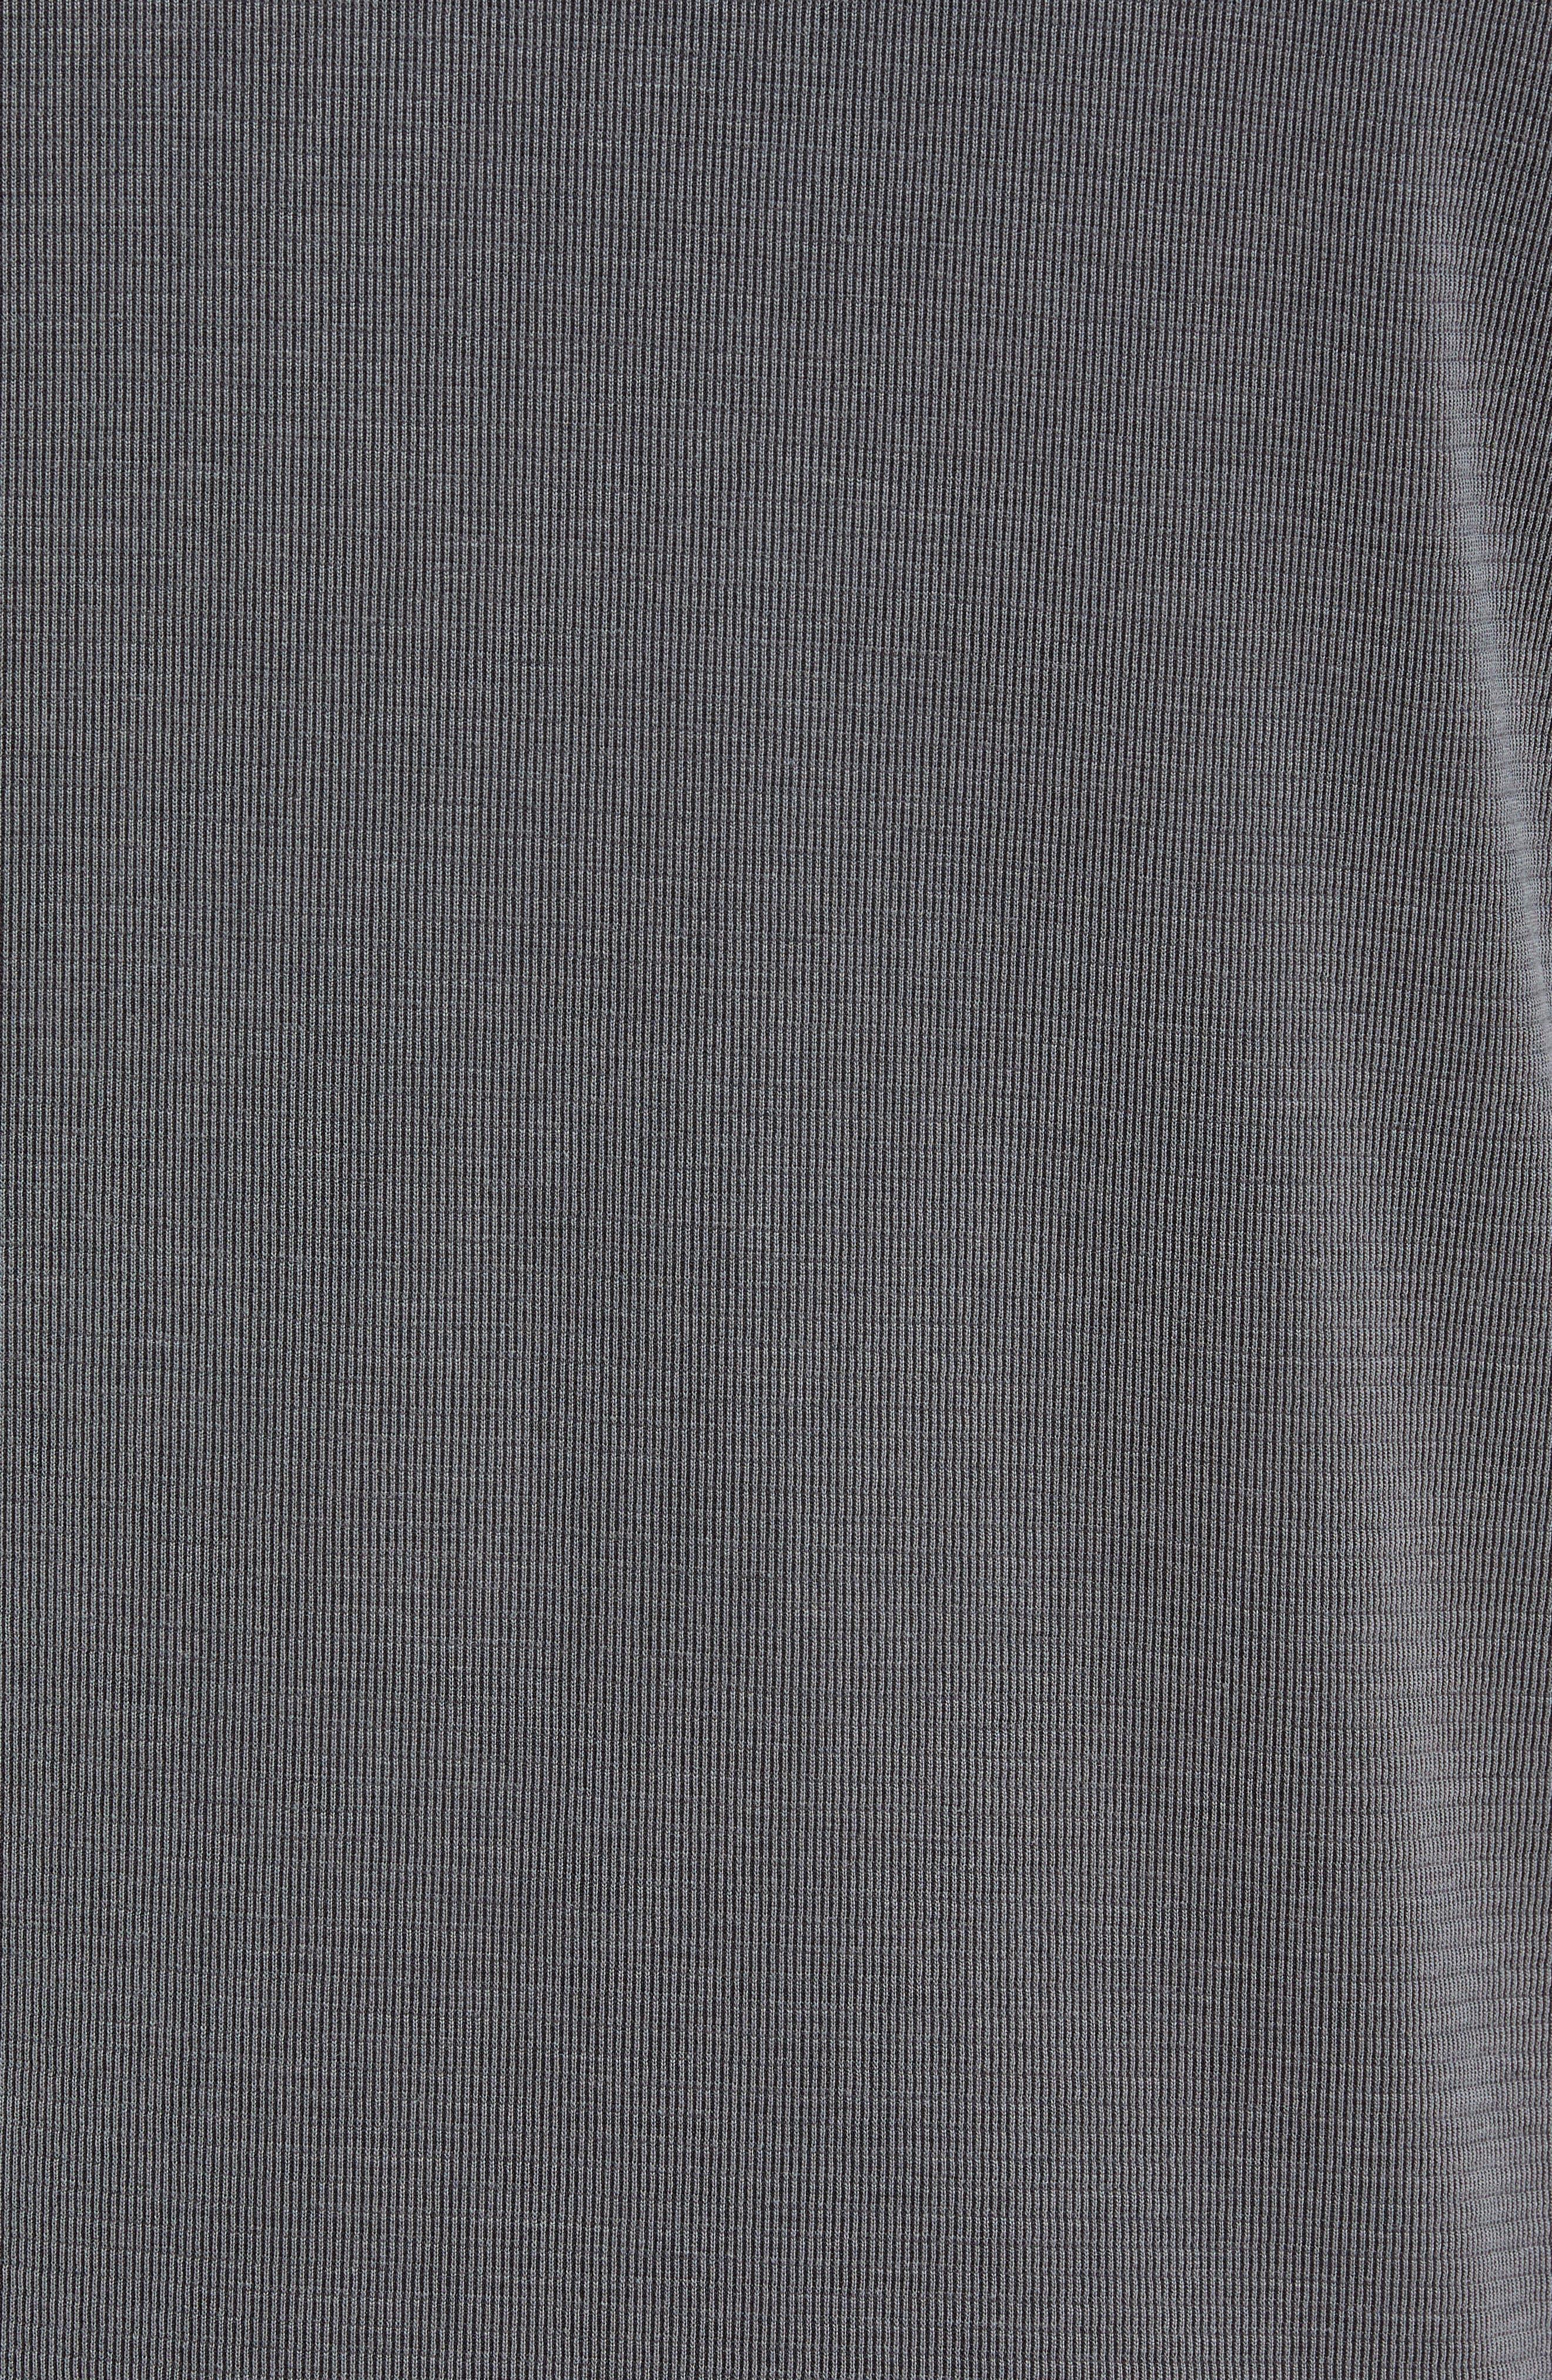 TOMMY BAHAMA, Coastal Crest Regular Fit Polo, Alternate thumbnail 5, color, BLACK